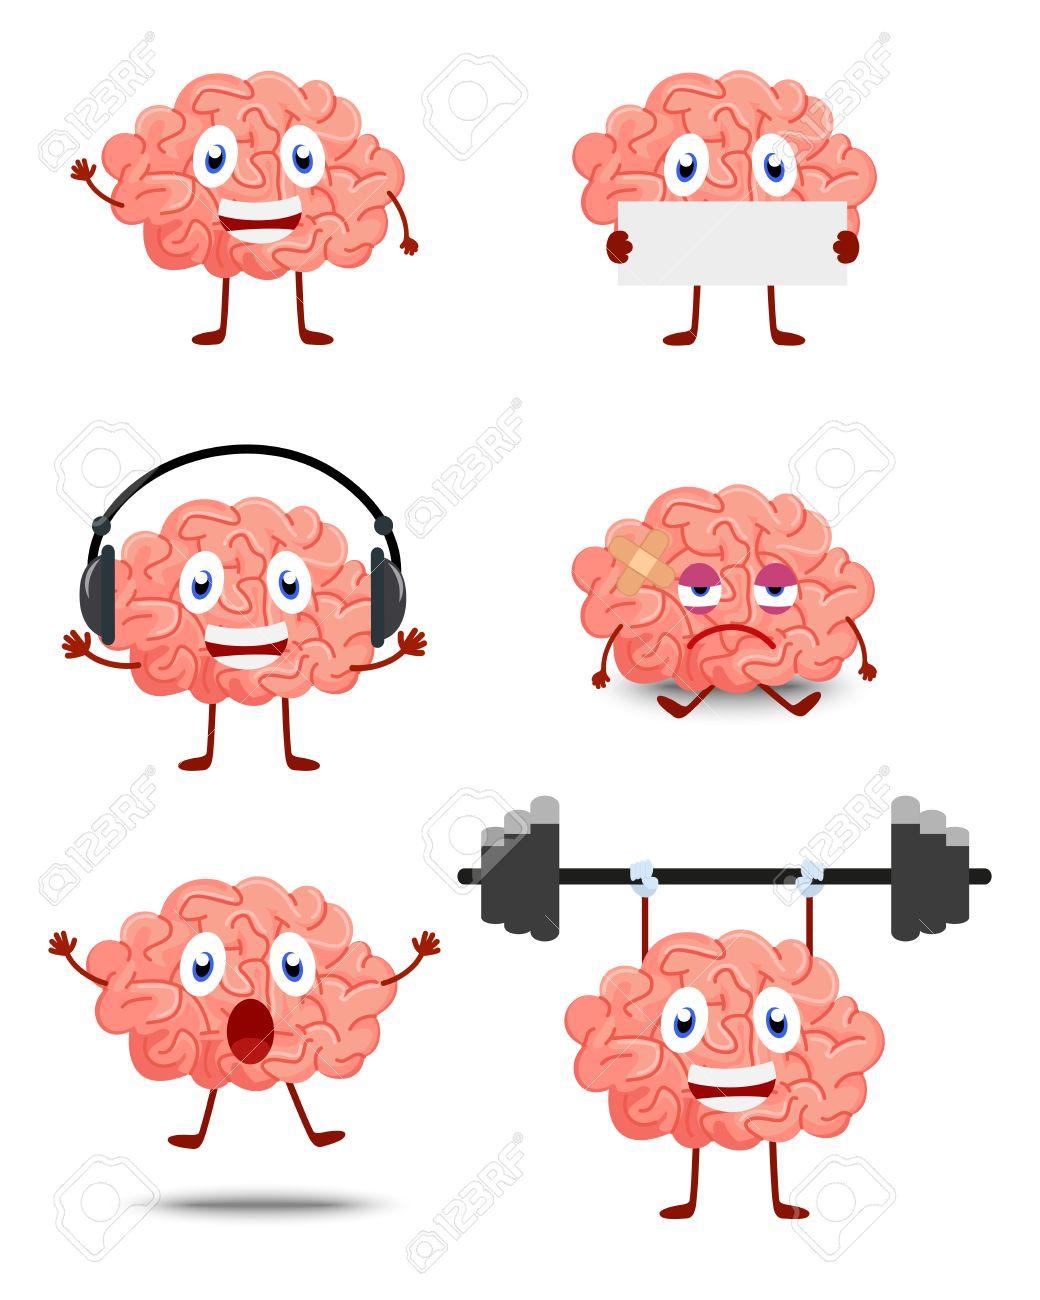 Cute Brain cartoon.